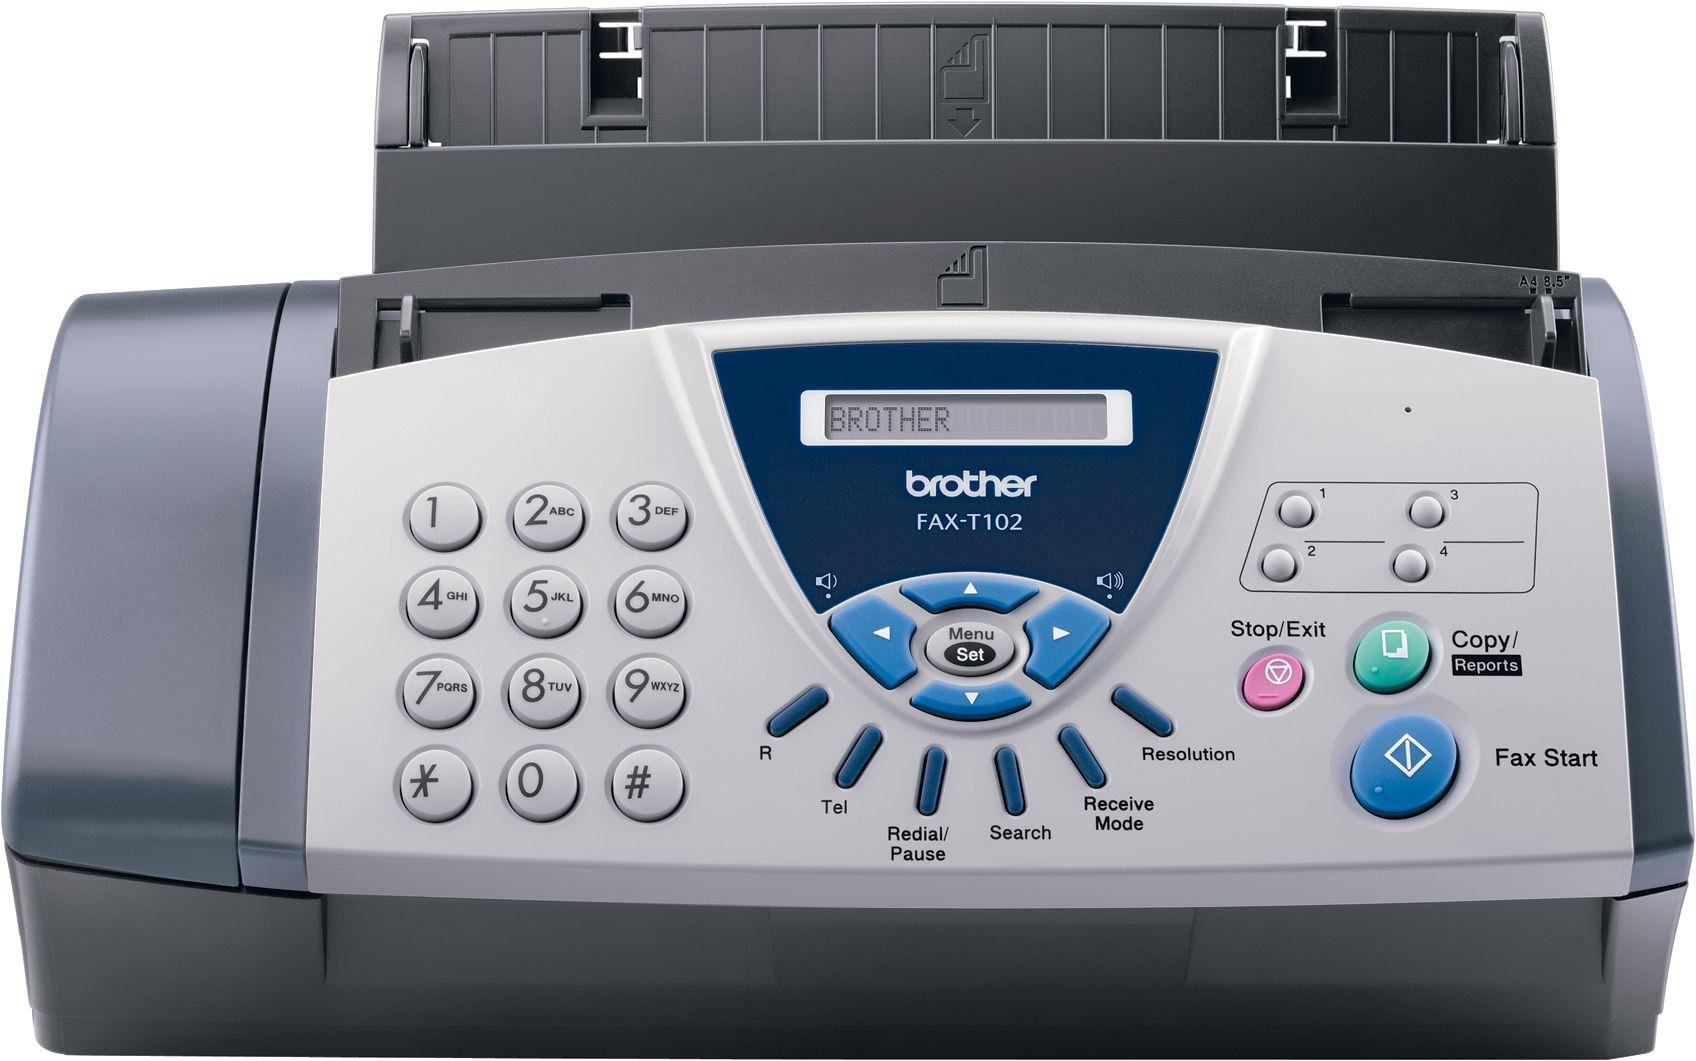 nearby fax machine